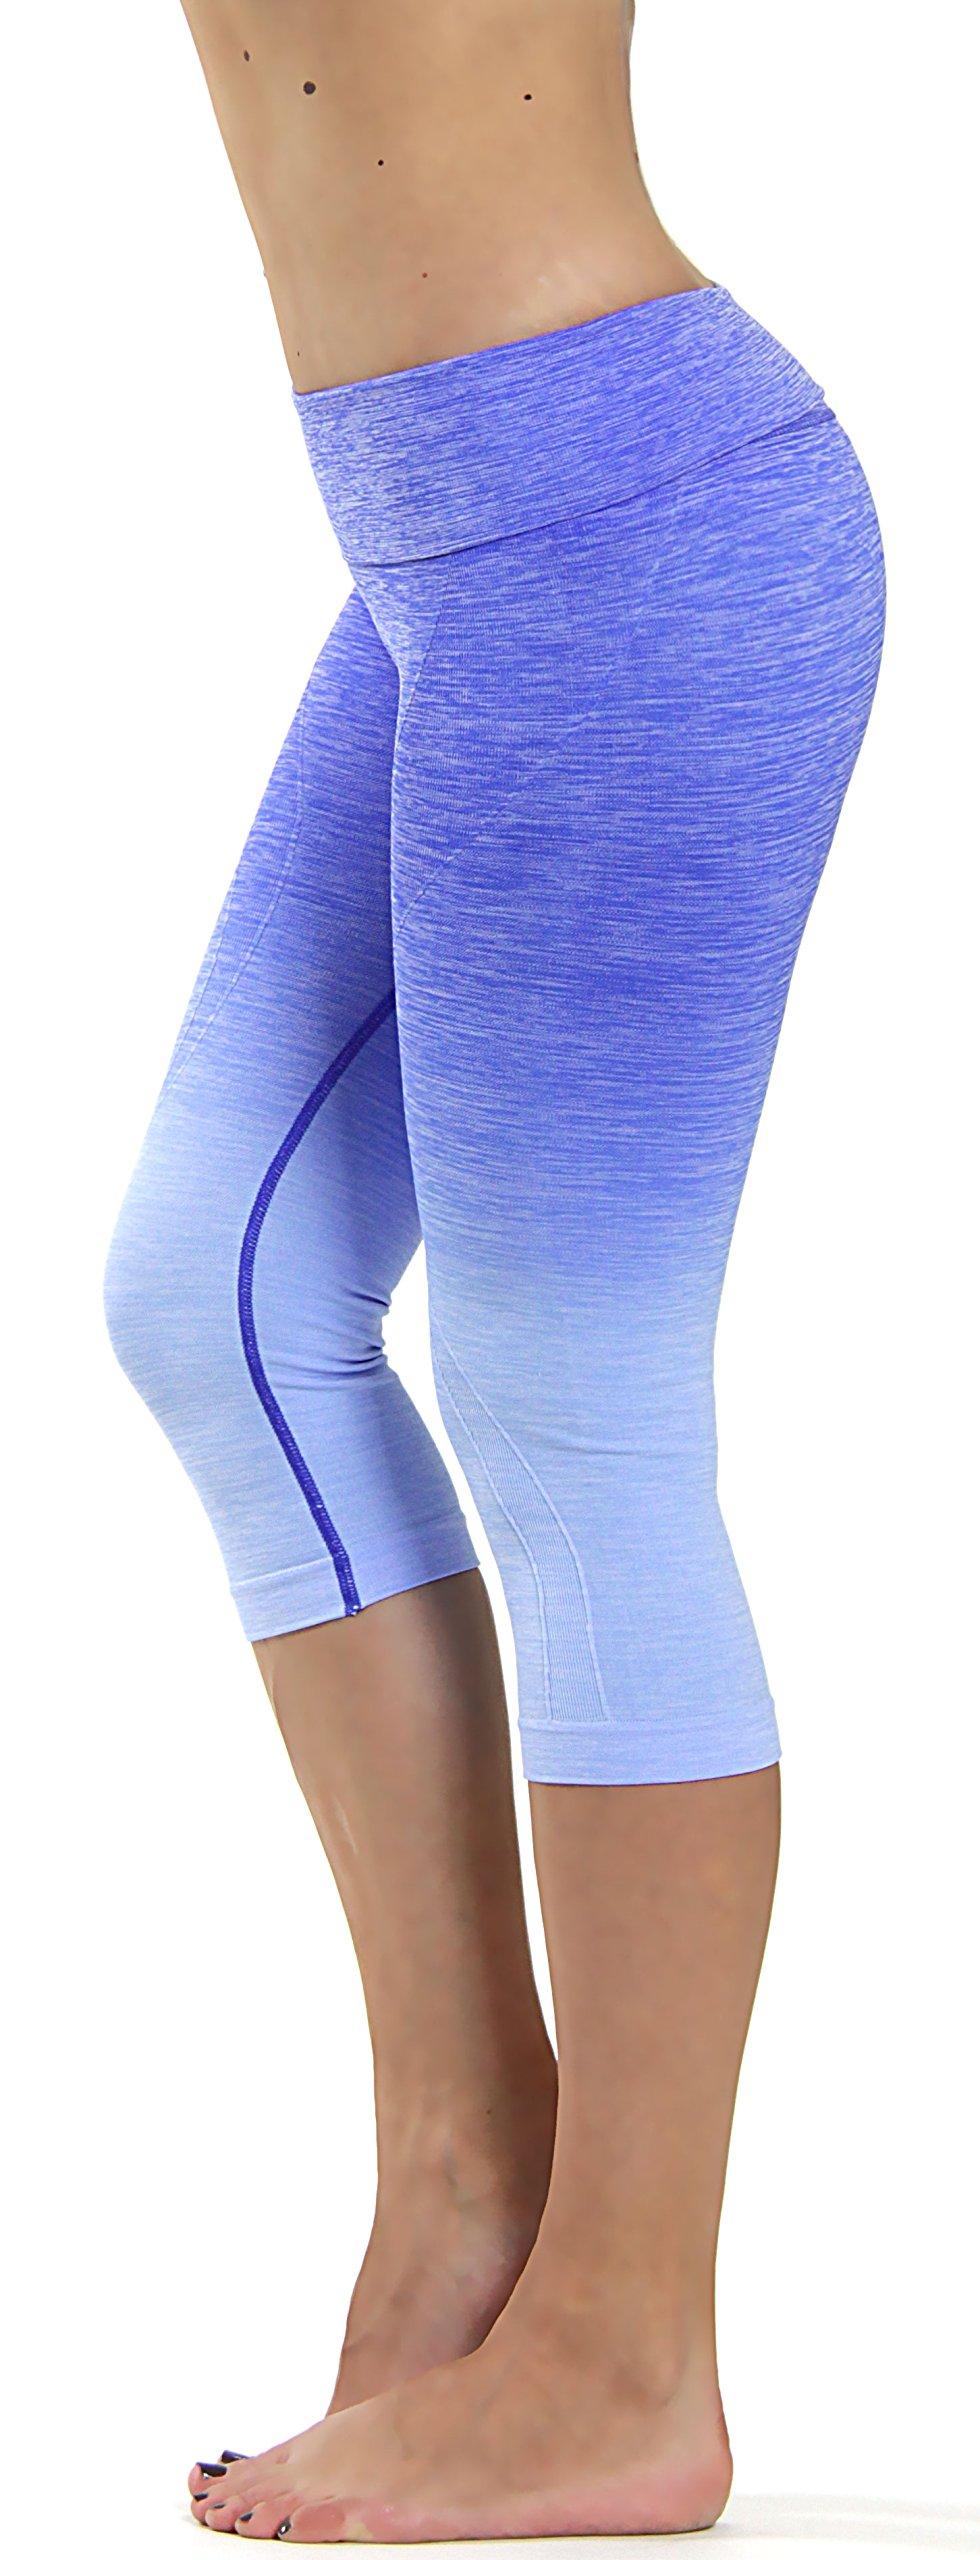 Prolific Health Fitness Power Flex Yoga Pants Leggings XS - XL (Large, Capri Ombre Royal Blue)